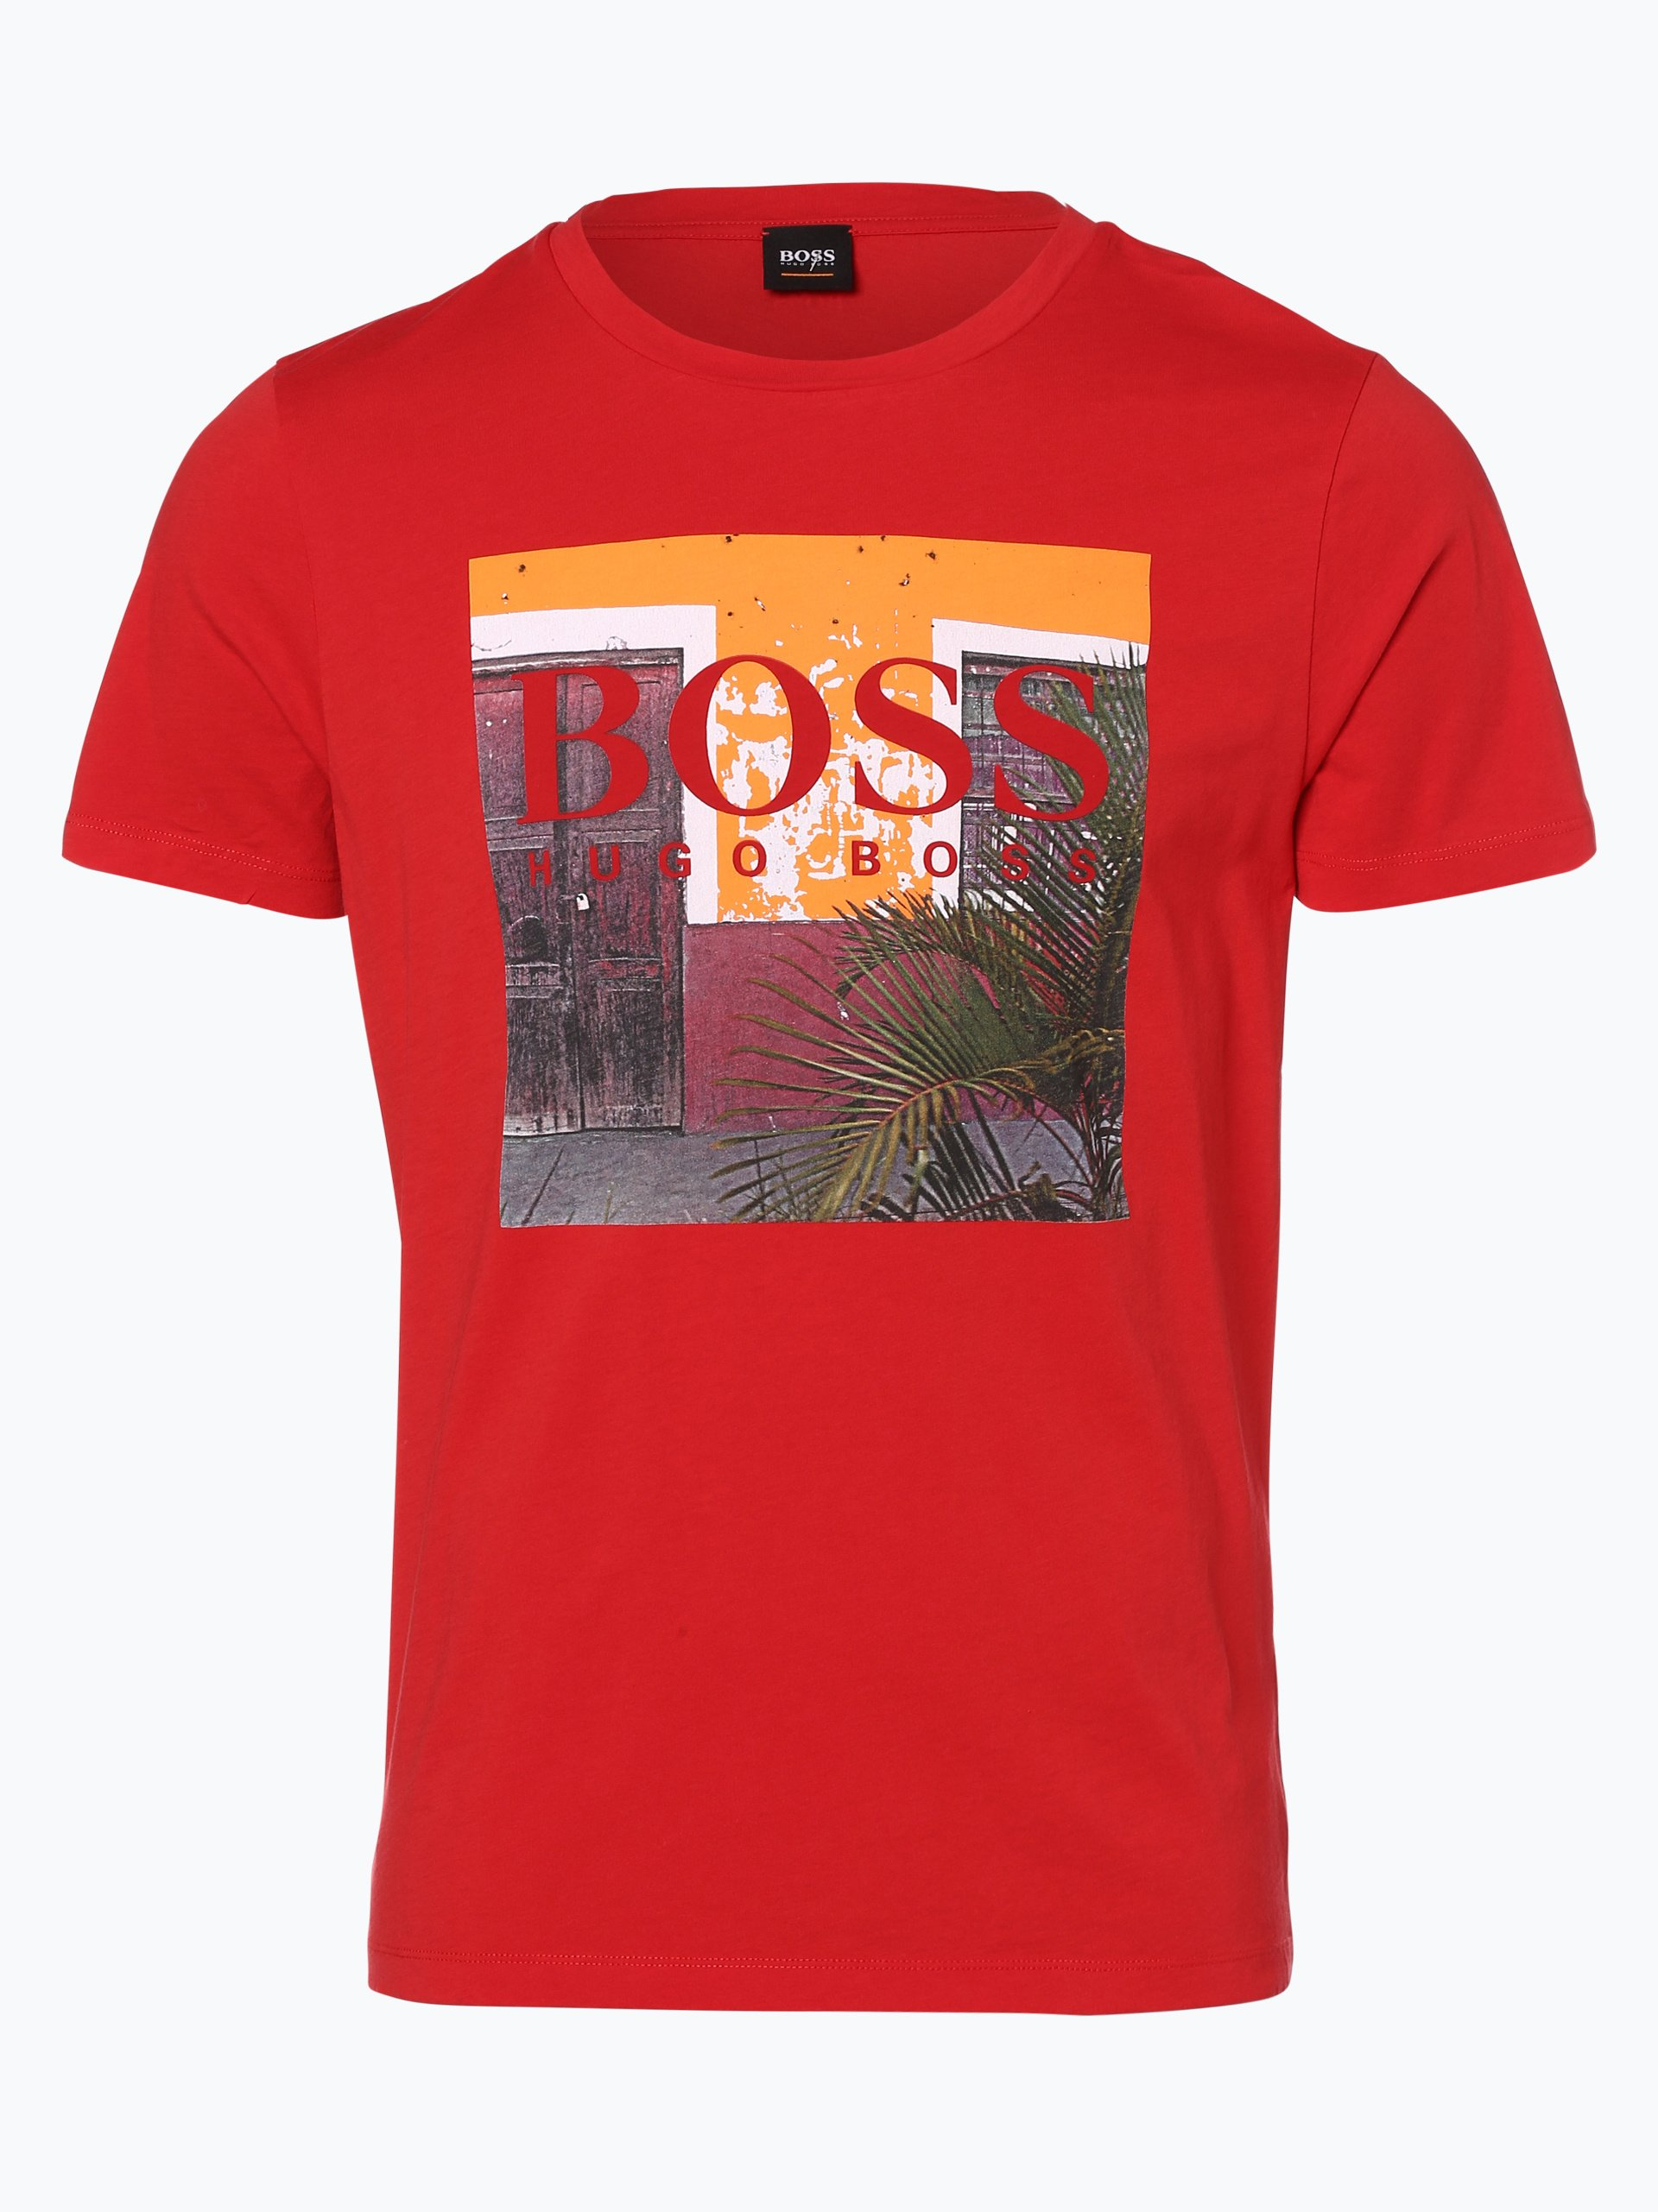 BOSS Casual Herren T-Shirt - Tux1